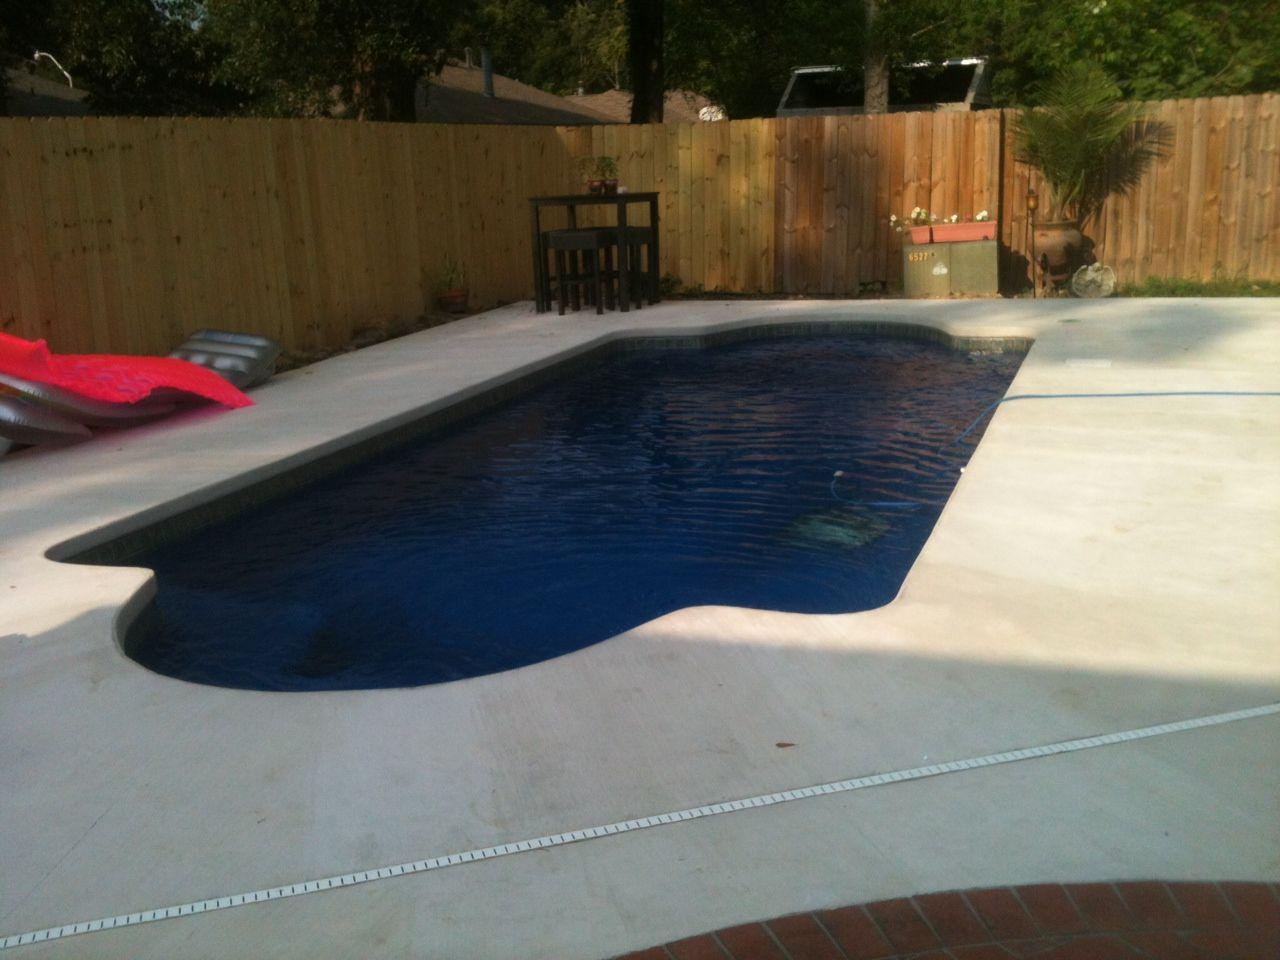 Central Pools Baton Rouge Fiberglass Pools Fiberglass Pools Pool Swimming Pools